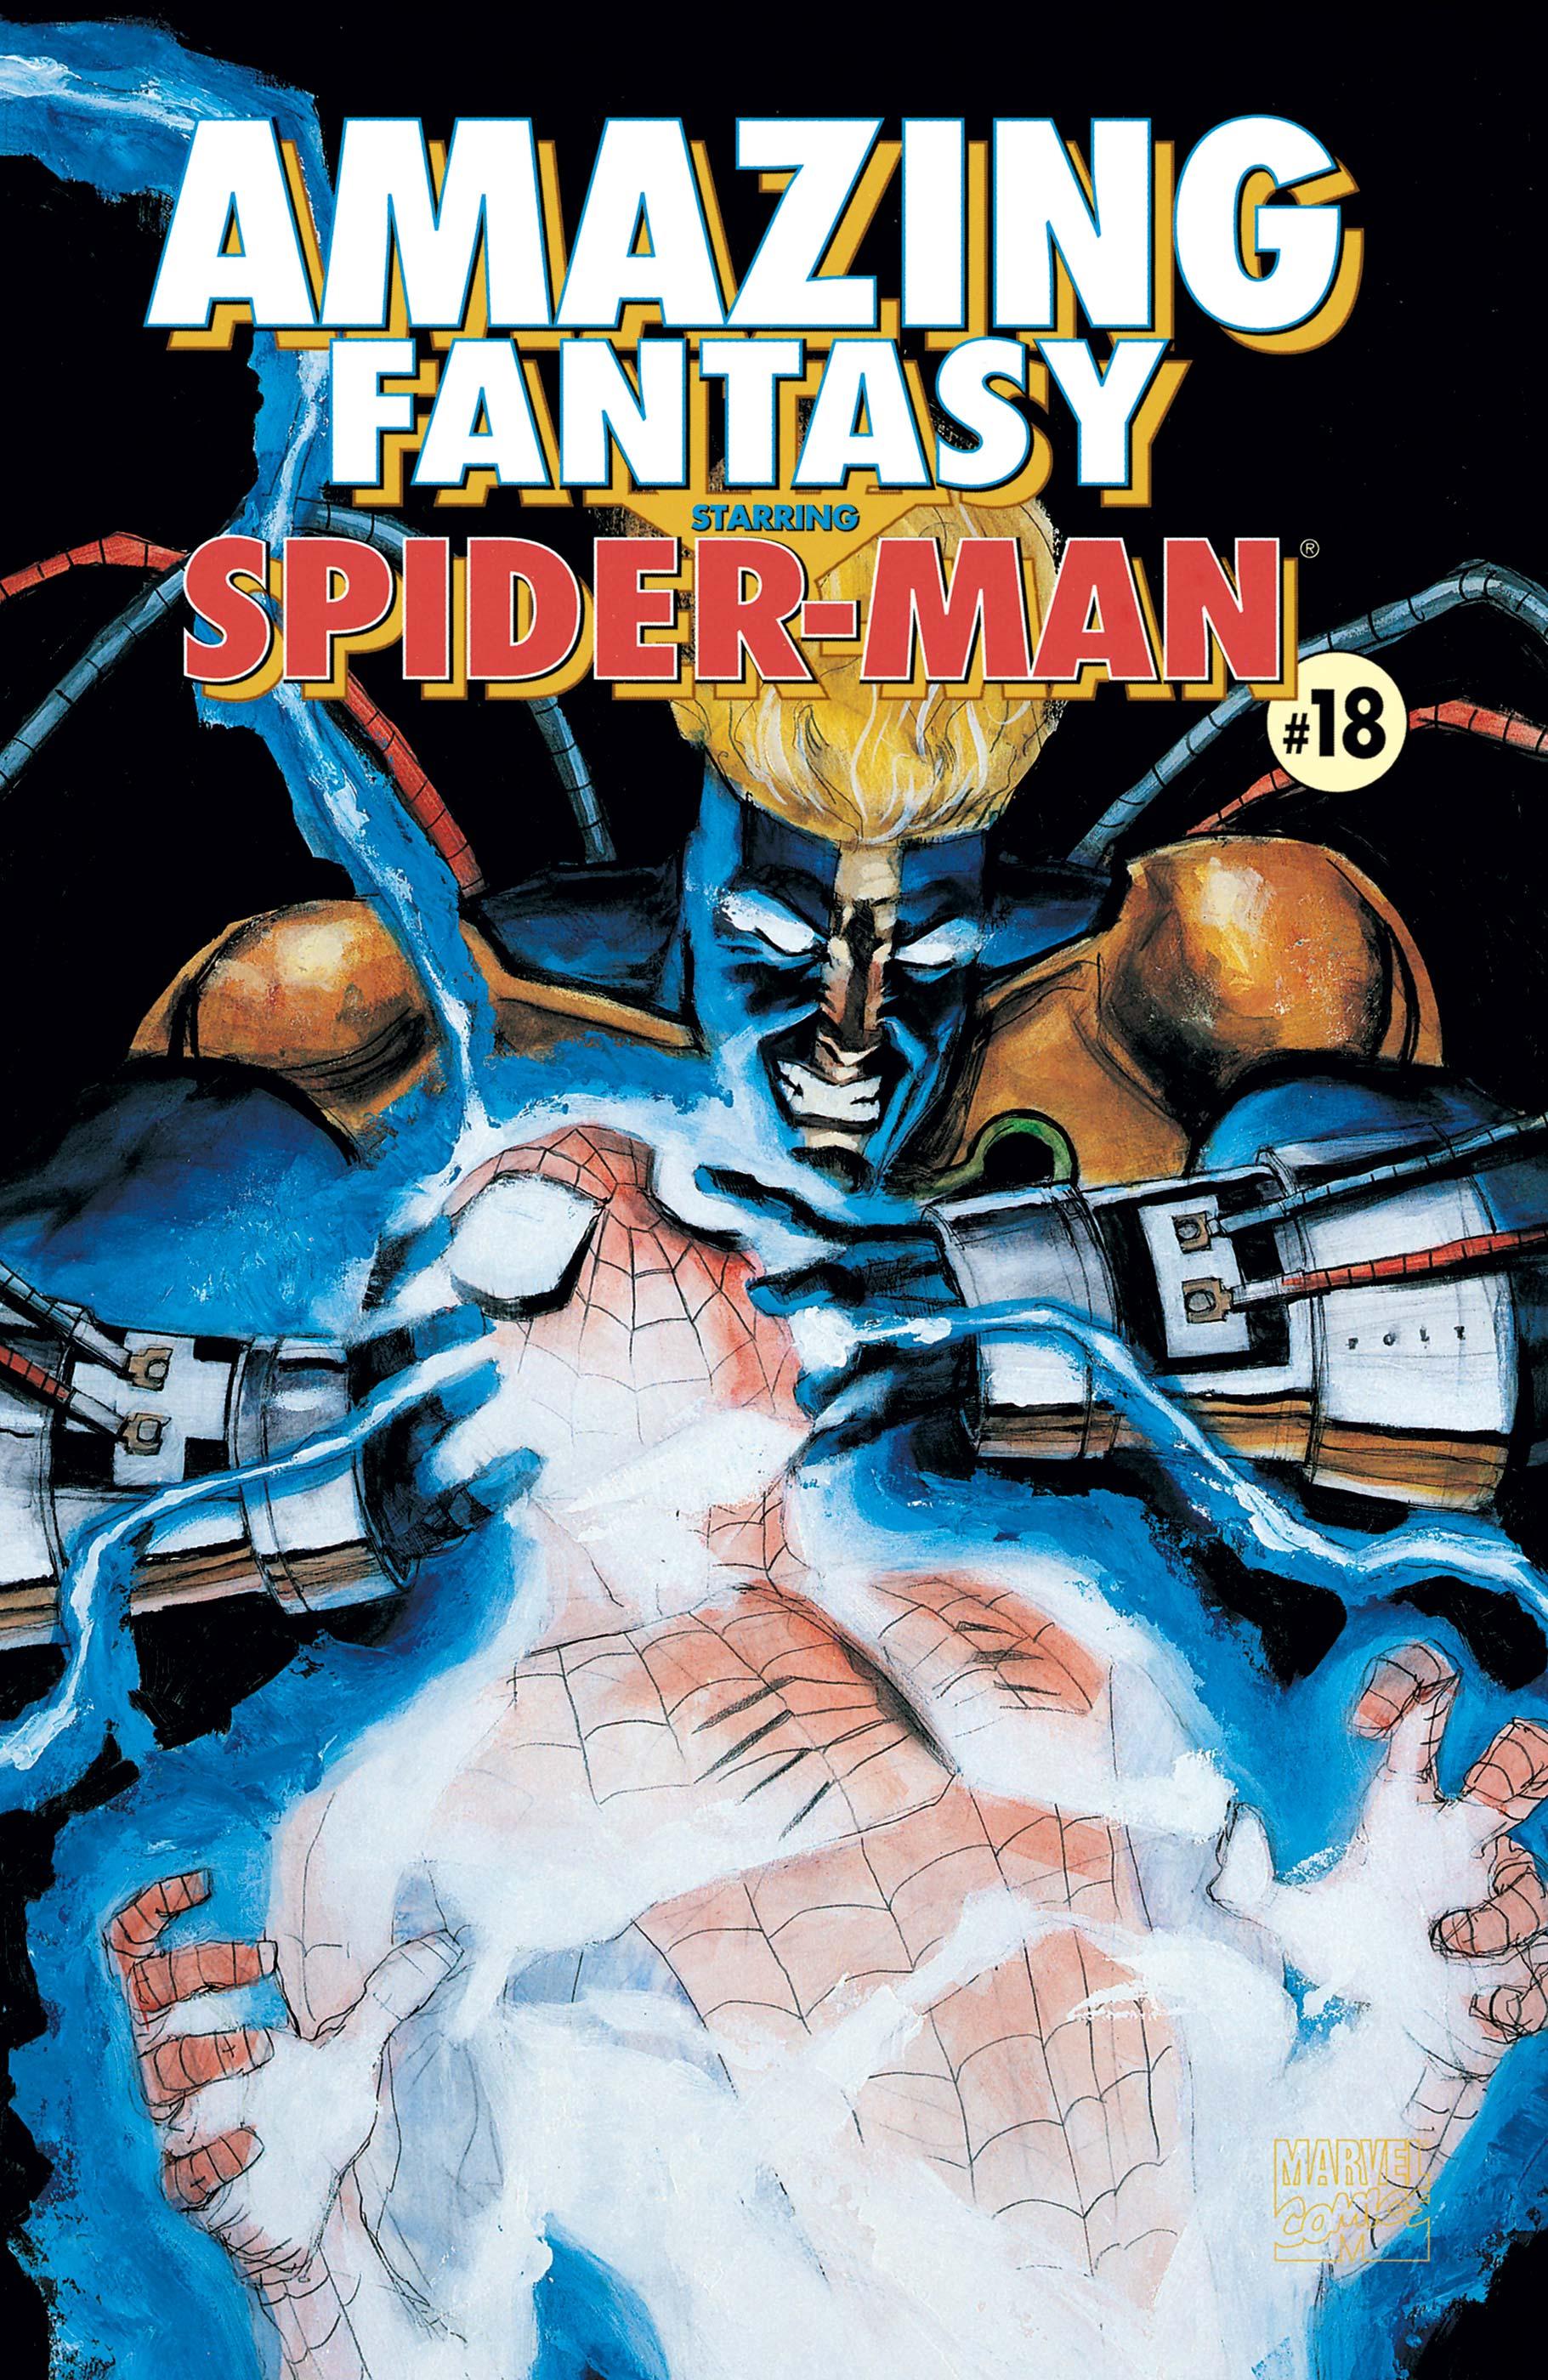 Amazing Fantasy (1995) #18